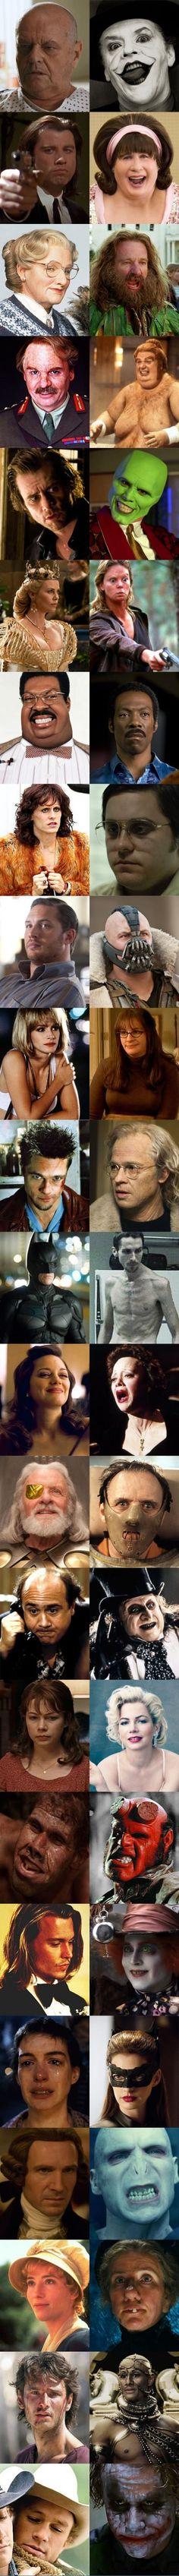 Contrasting Roles, actors.......wow.....interesting.....